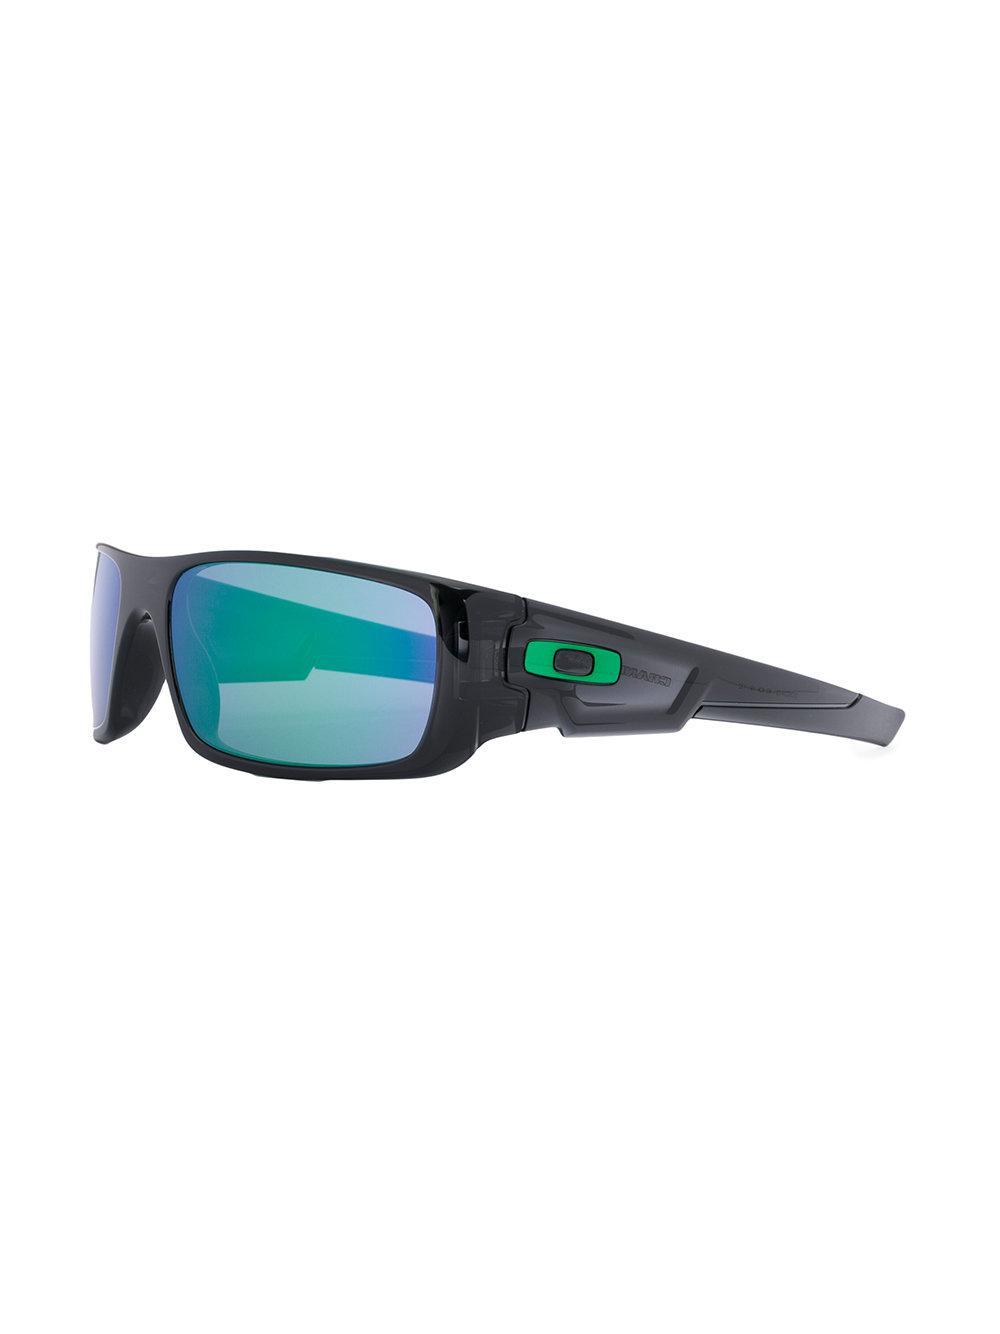 Oakley Crankshaft Sunglasses in Black